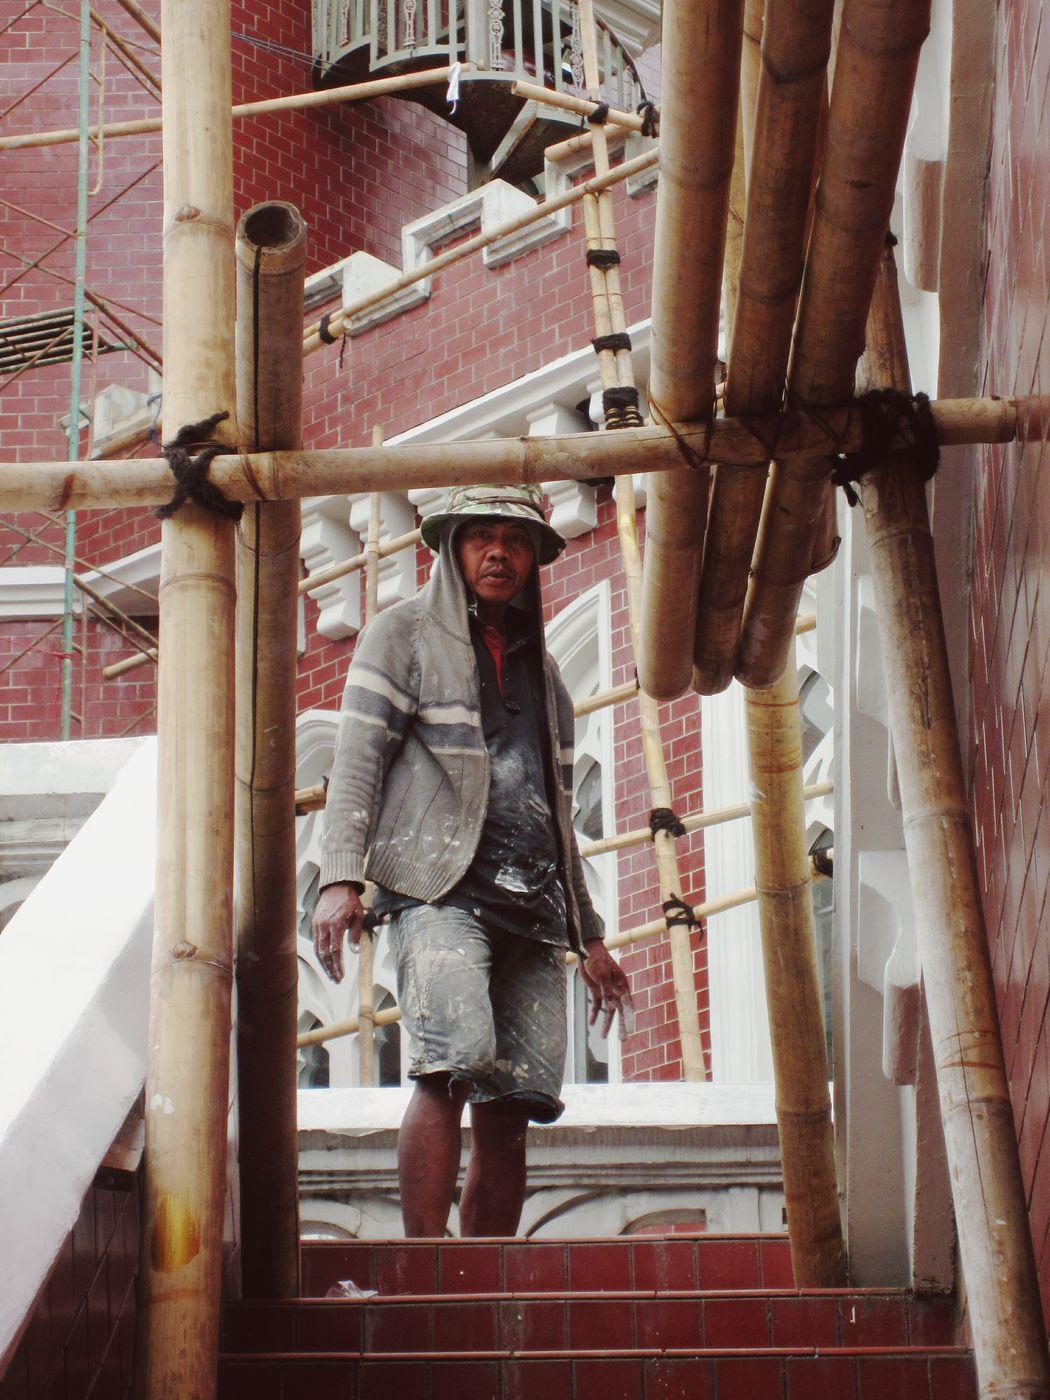 He looks like want to kill me 😂😂🙇🙇 Construction Construction Worker Man Working Renovation Project Castle In Renovation Fierce Fierce Look at Taman Mini Indonesia Indah Jakarta INDONESIA Fresh On Eyeem